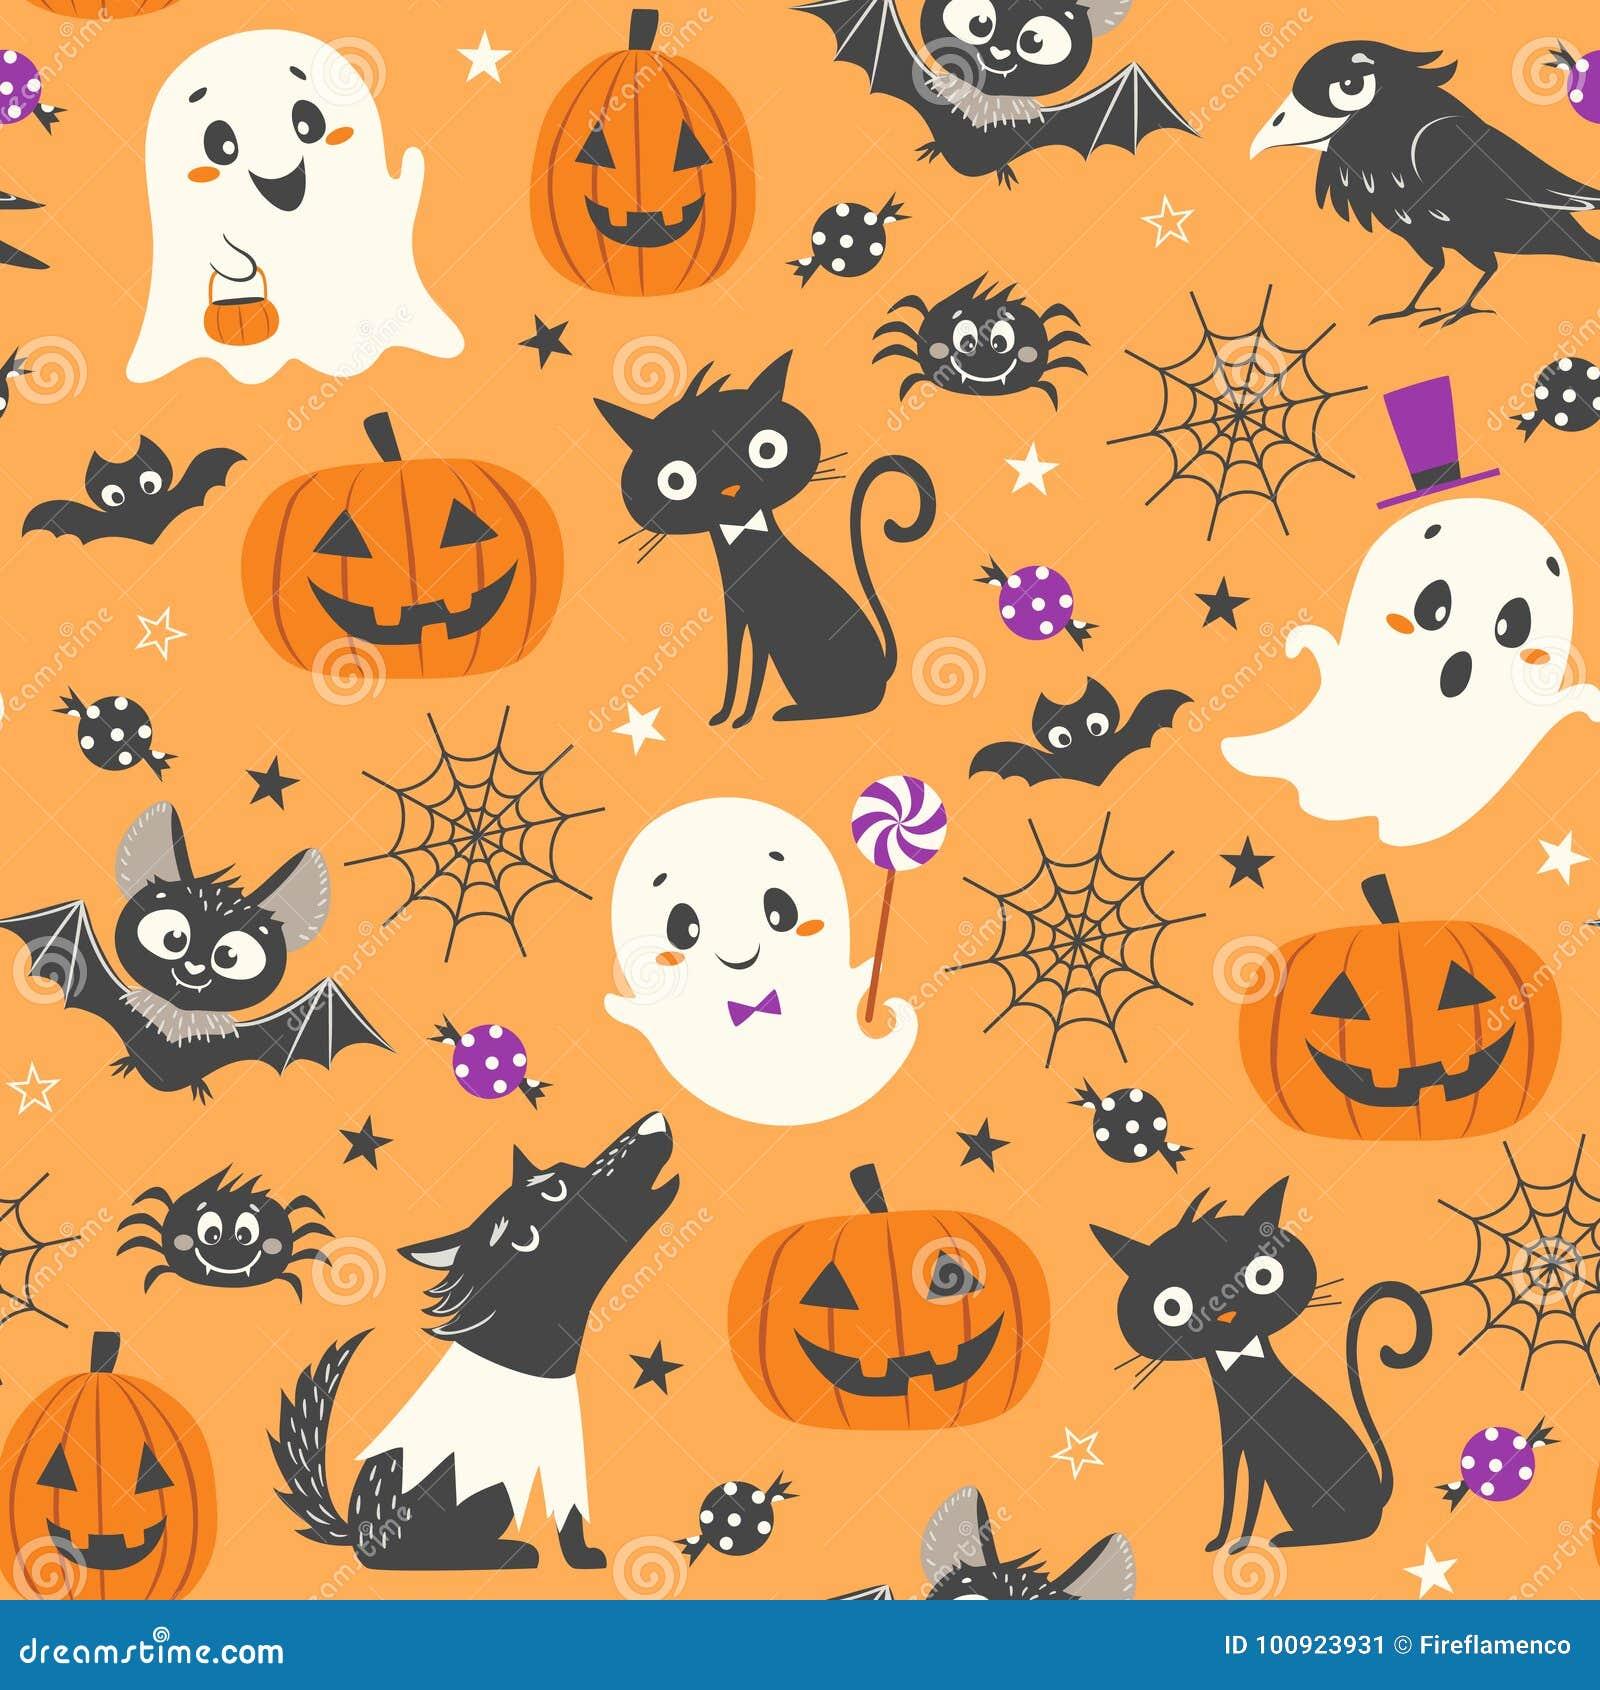 220 Free Printable Halloween Pumpkin Carving 8